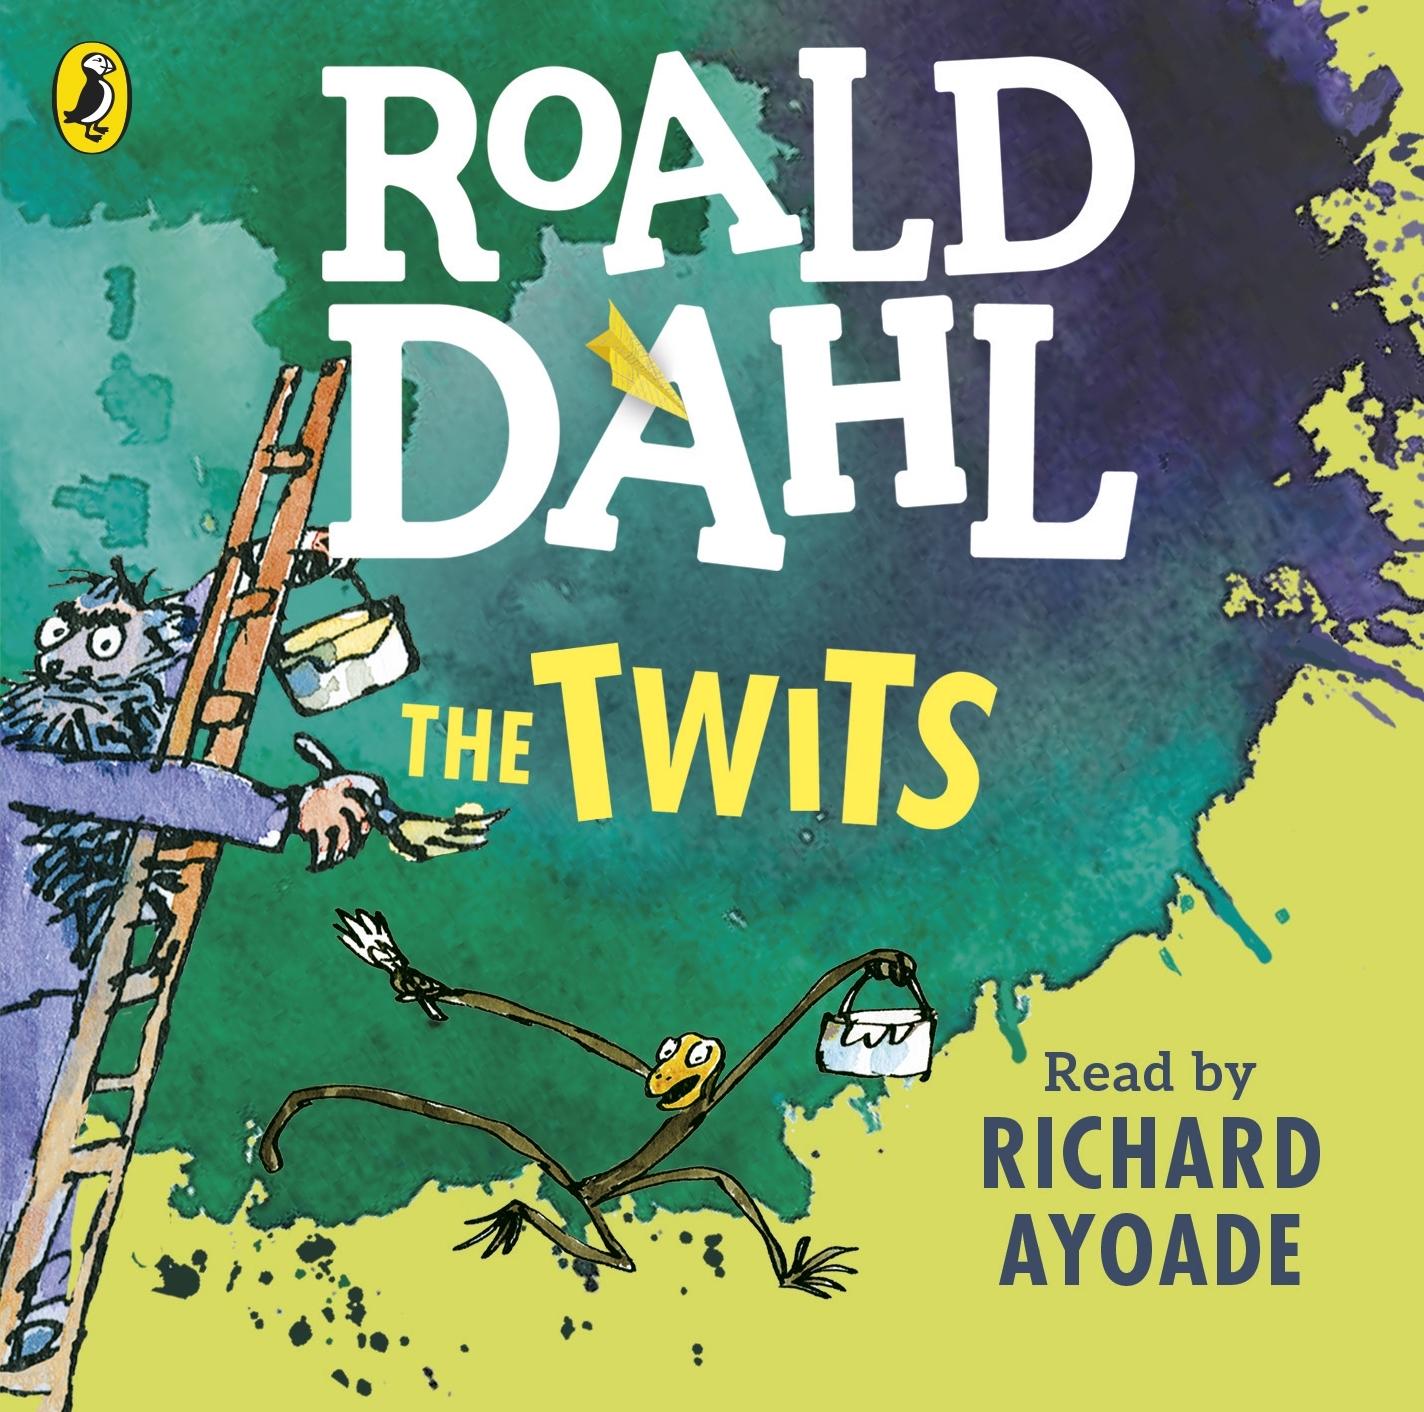 Roald Dahl Book Cover Pictures ~ The twits penguin books australia